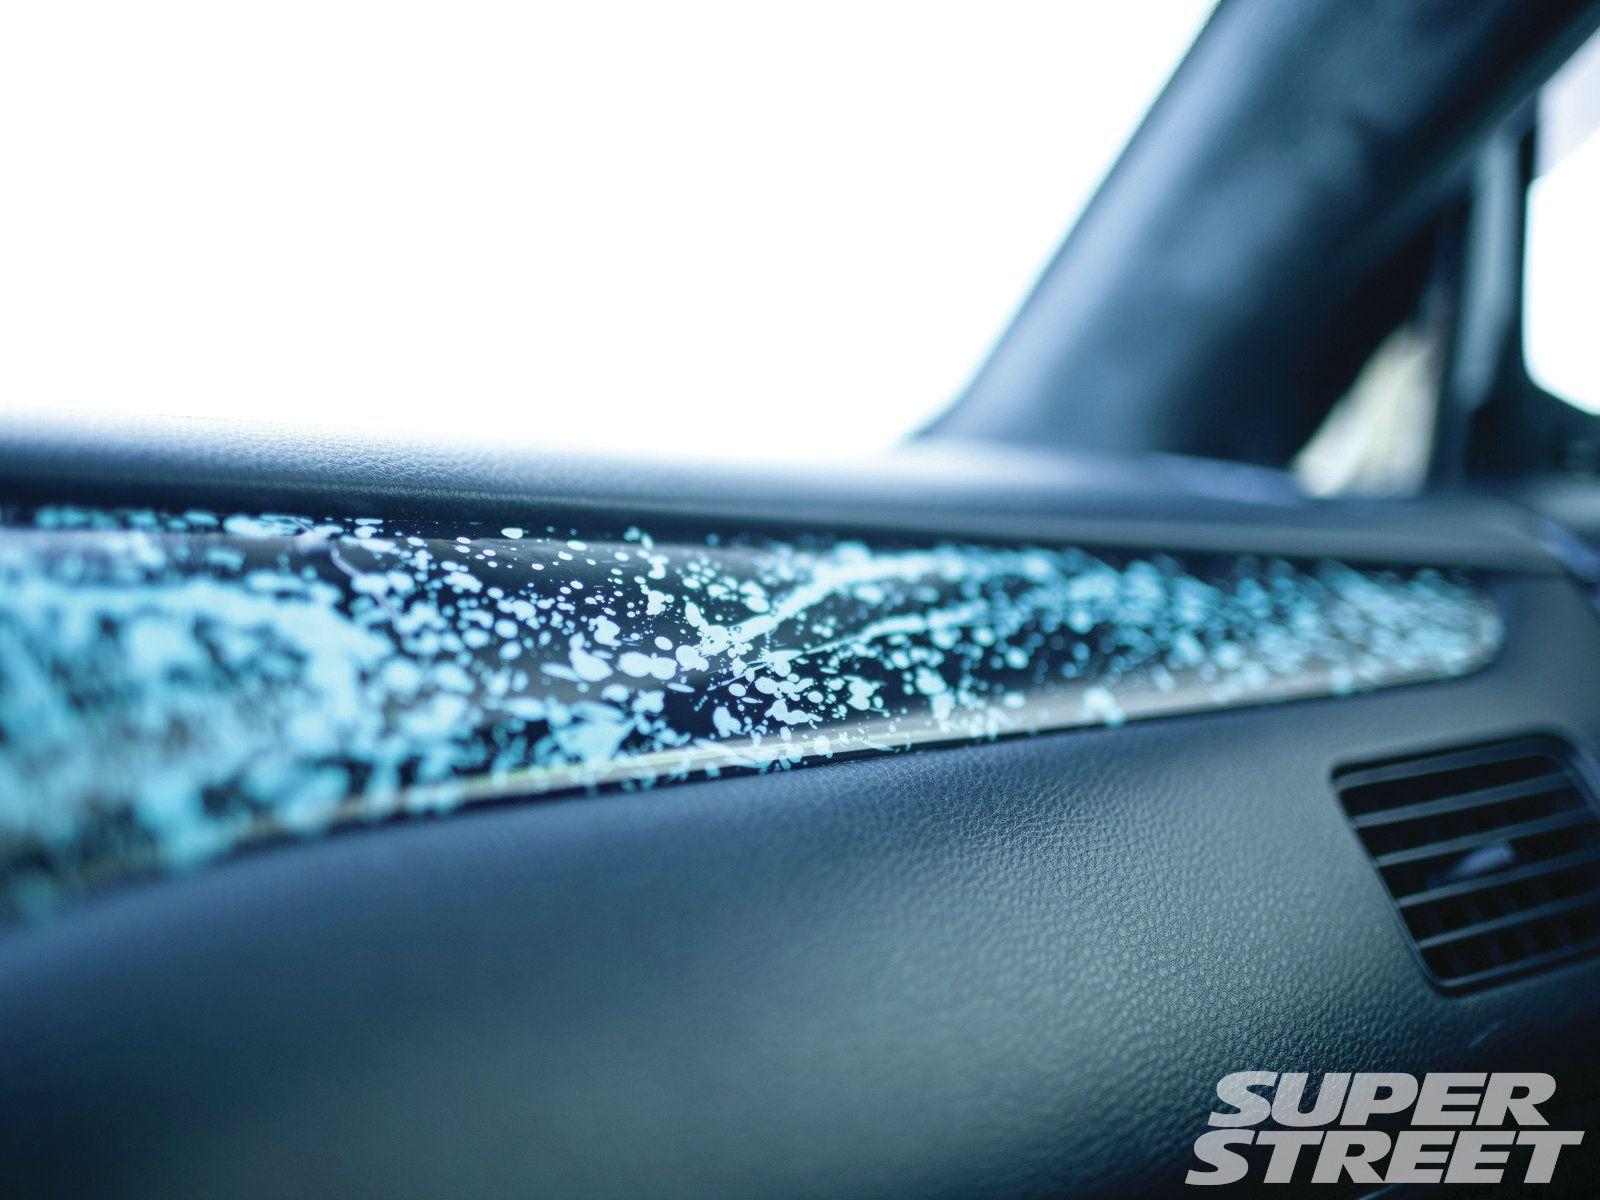 Car interior paint job - Paint Splatter Interior